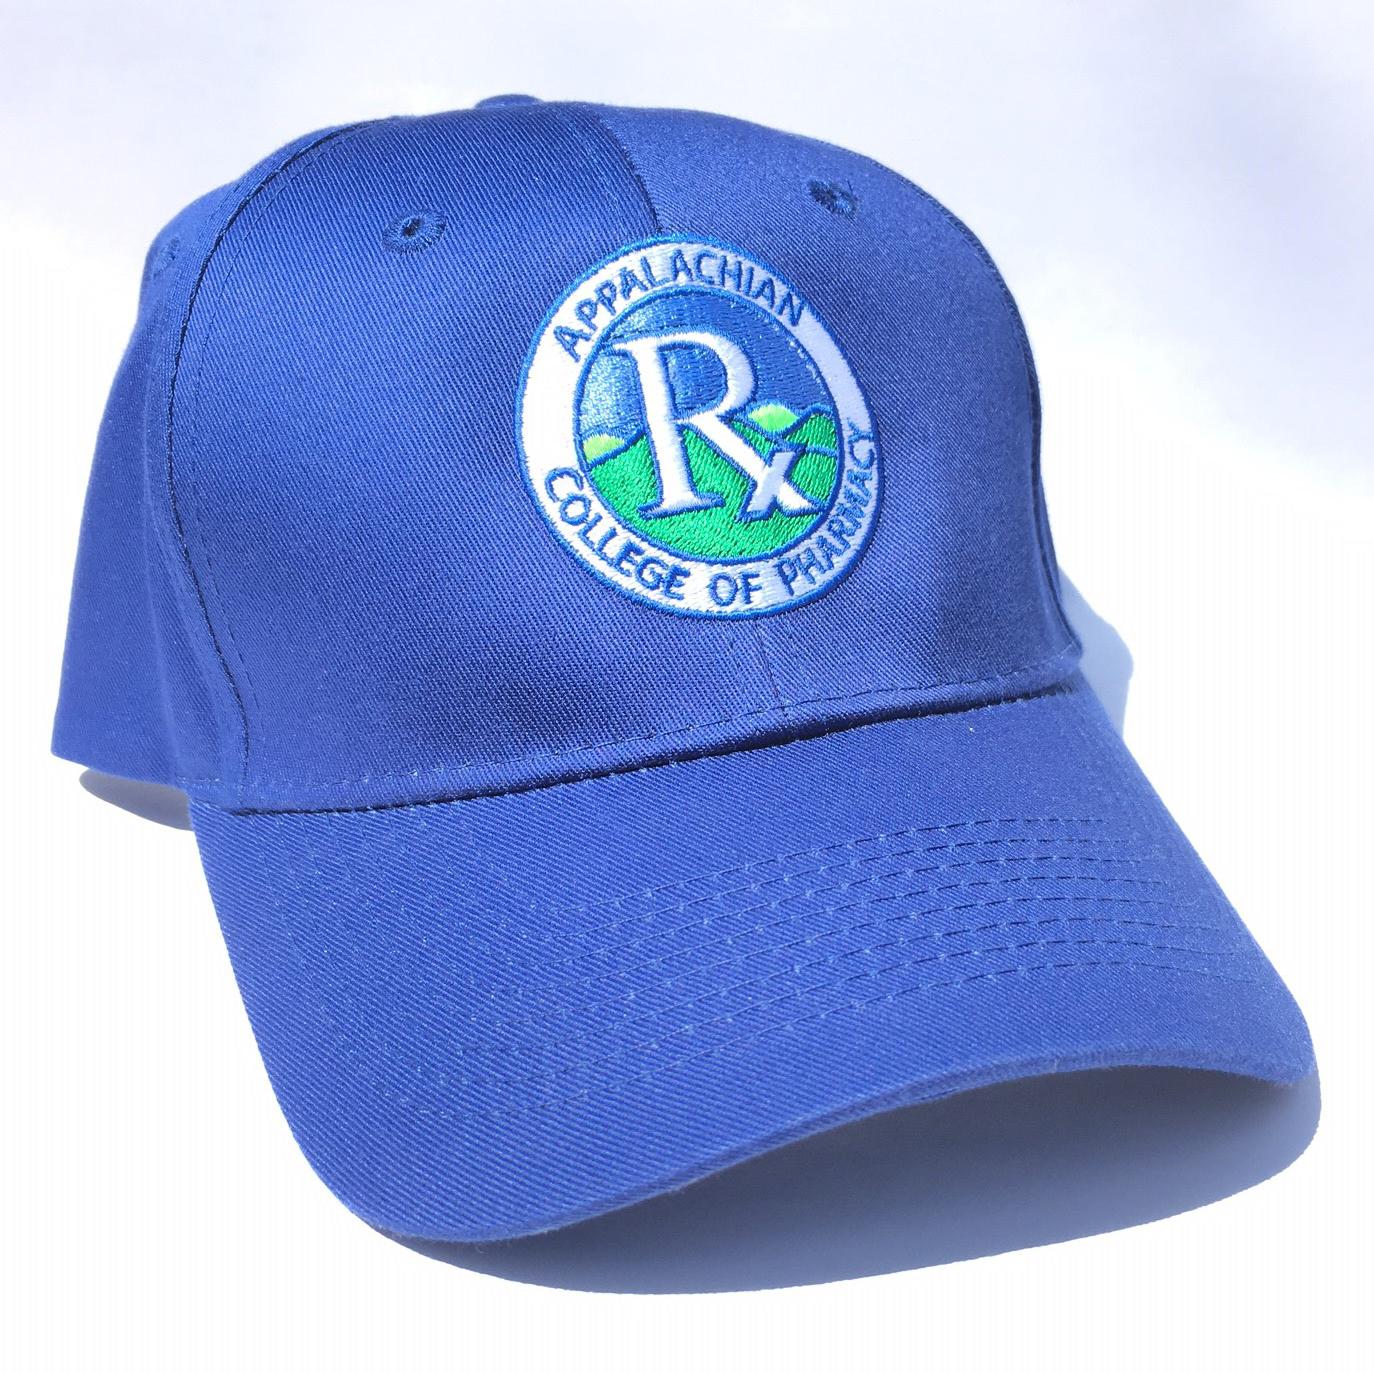 A close up of a royal hat